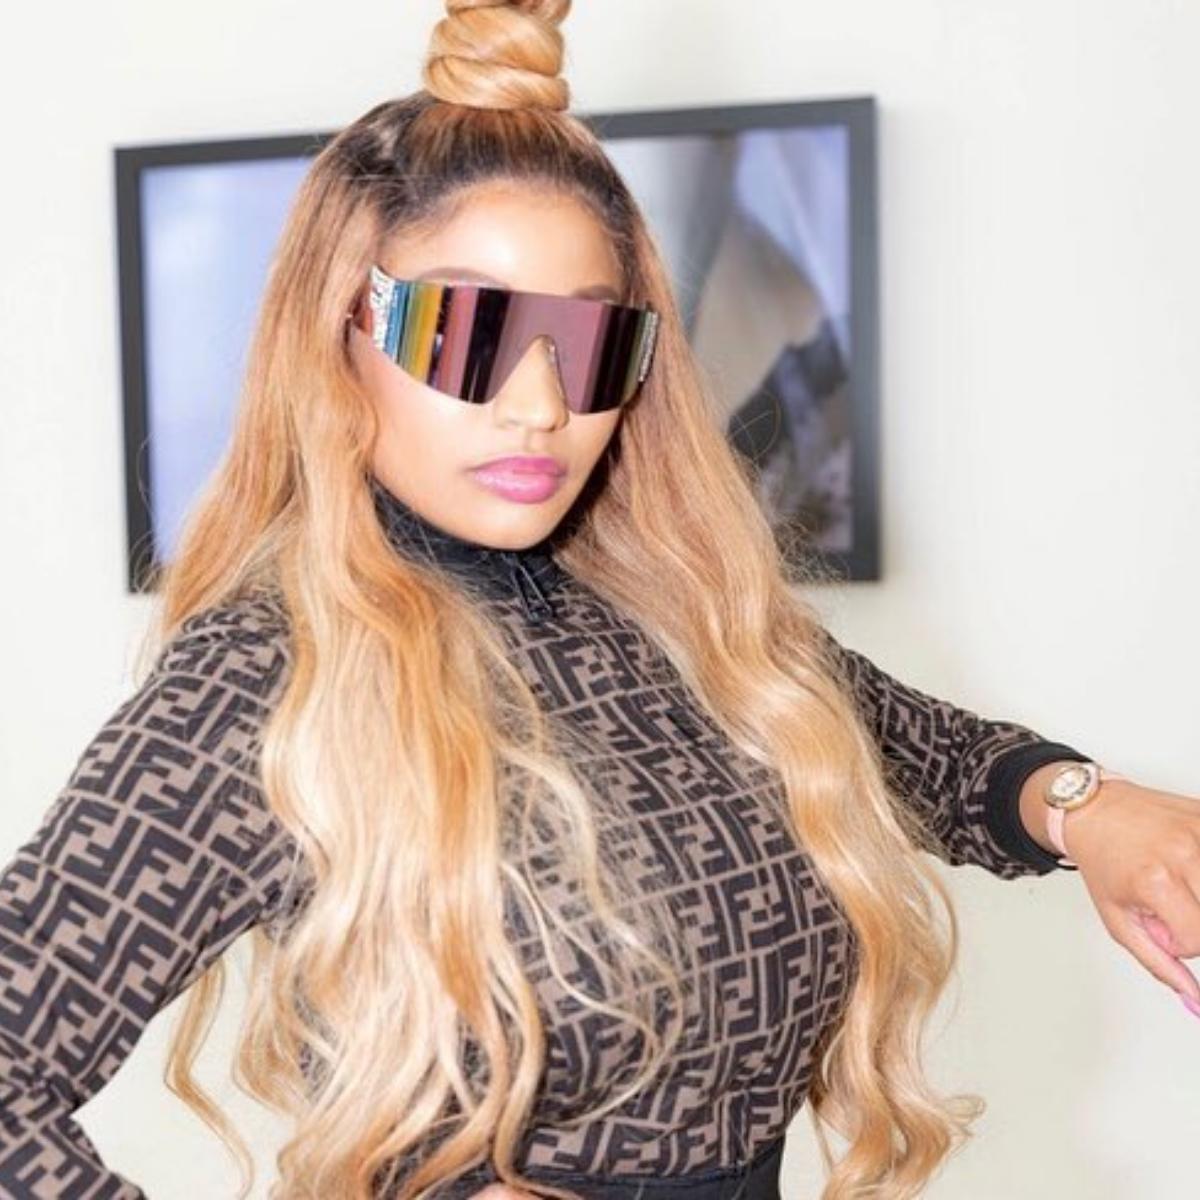 Nicki Minaj Uses Booty Photo Sitting On Kenneth Petty To Address Haters